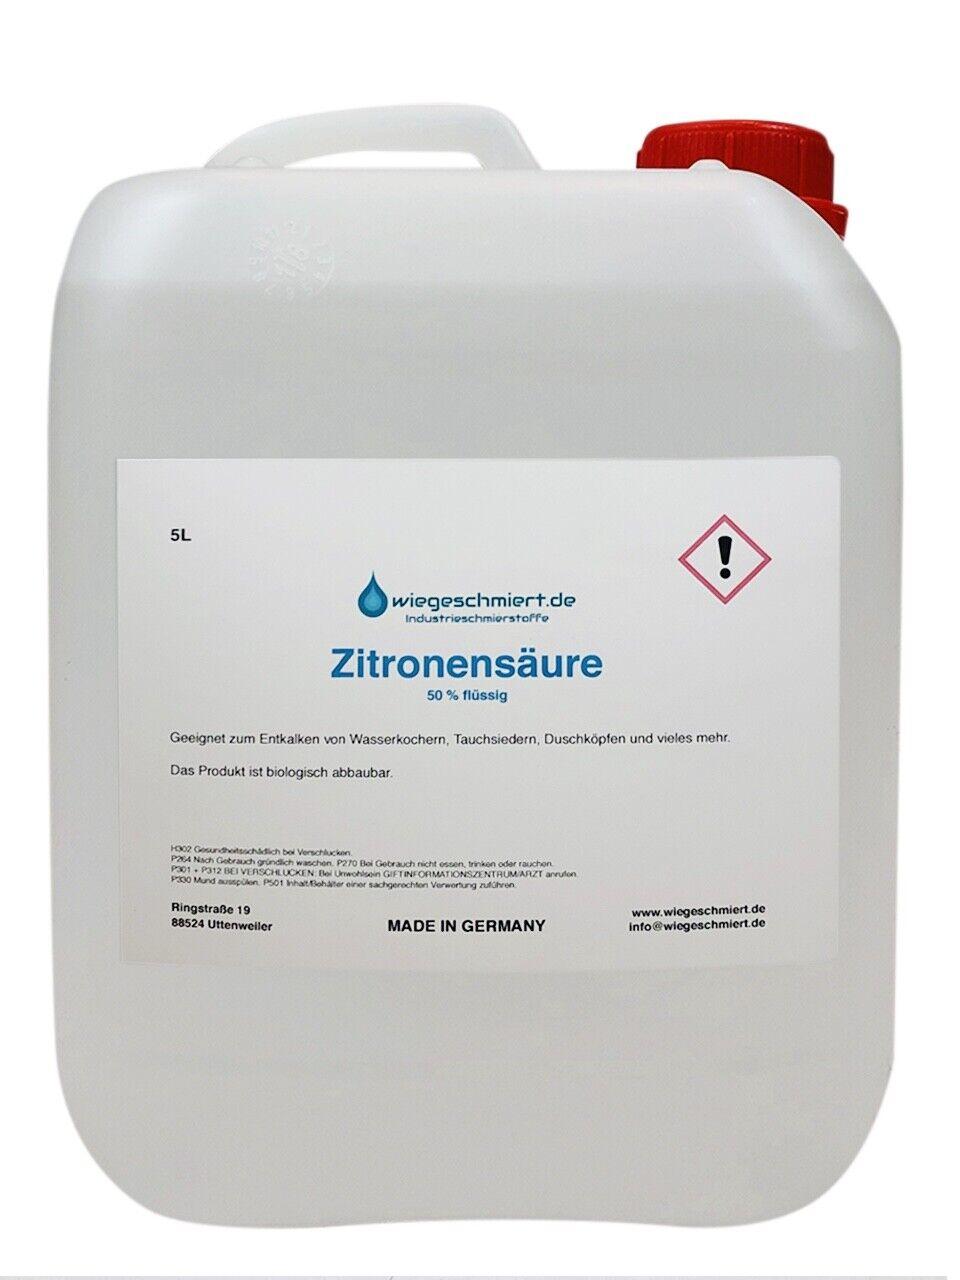 5 Liter Zitronensäure flüssig Entkalker Citronensäure Reiniger 5L Kanister